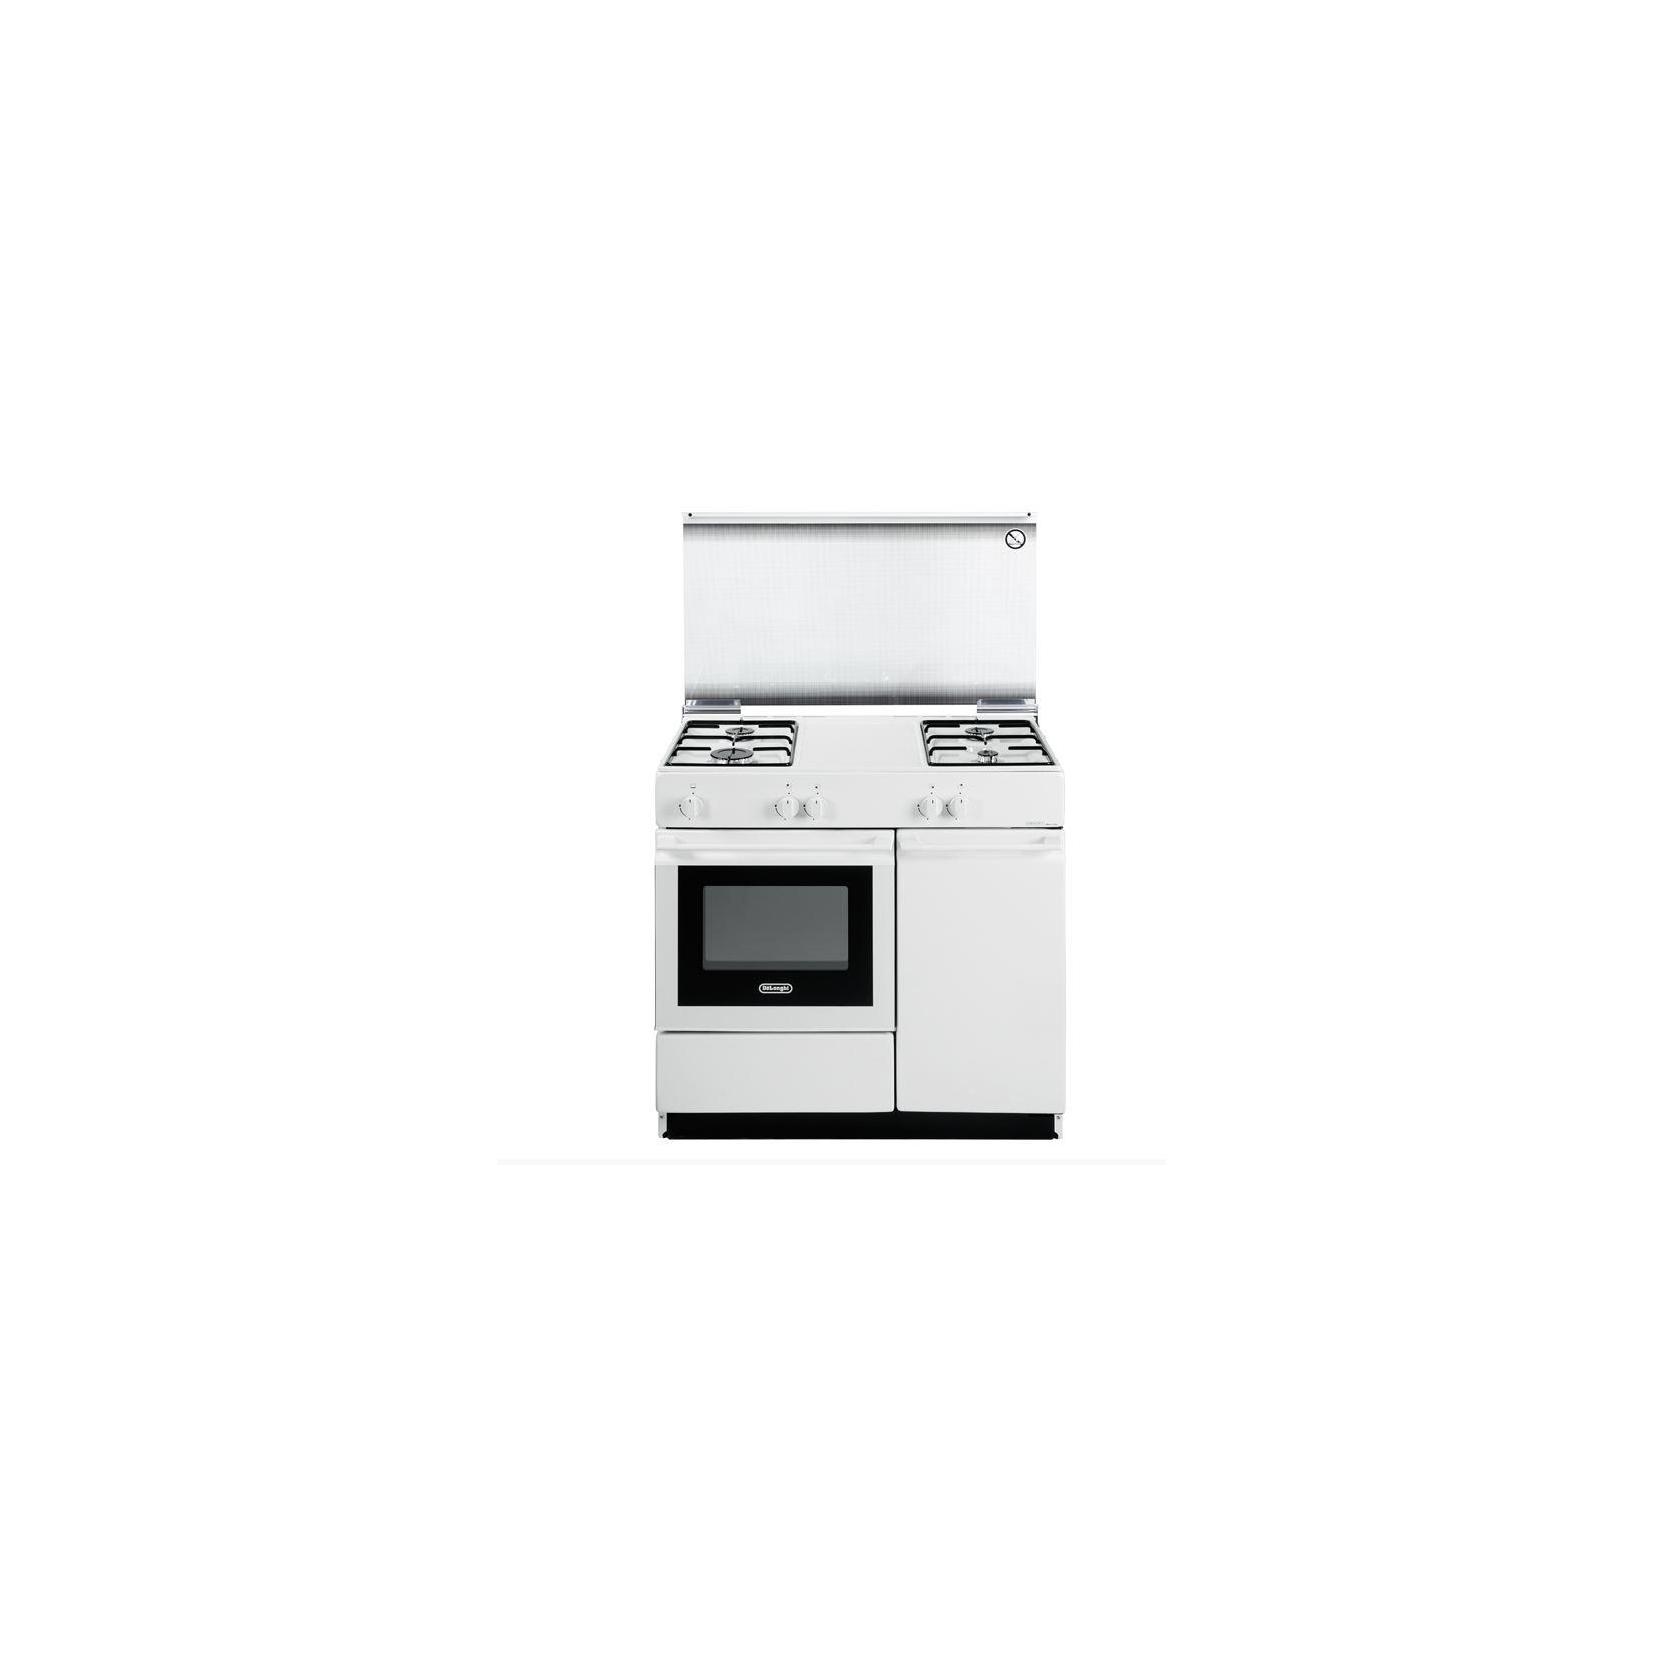 Cucina de longhi sgw854n bianca 86x50 4 fuochi forno gas term coperchio in cristallo - Cucina elettrica de longhi ...